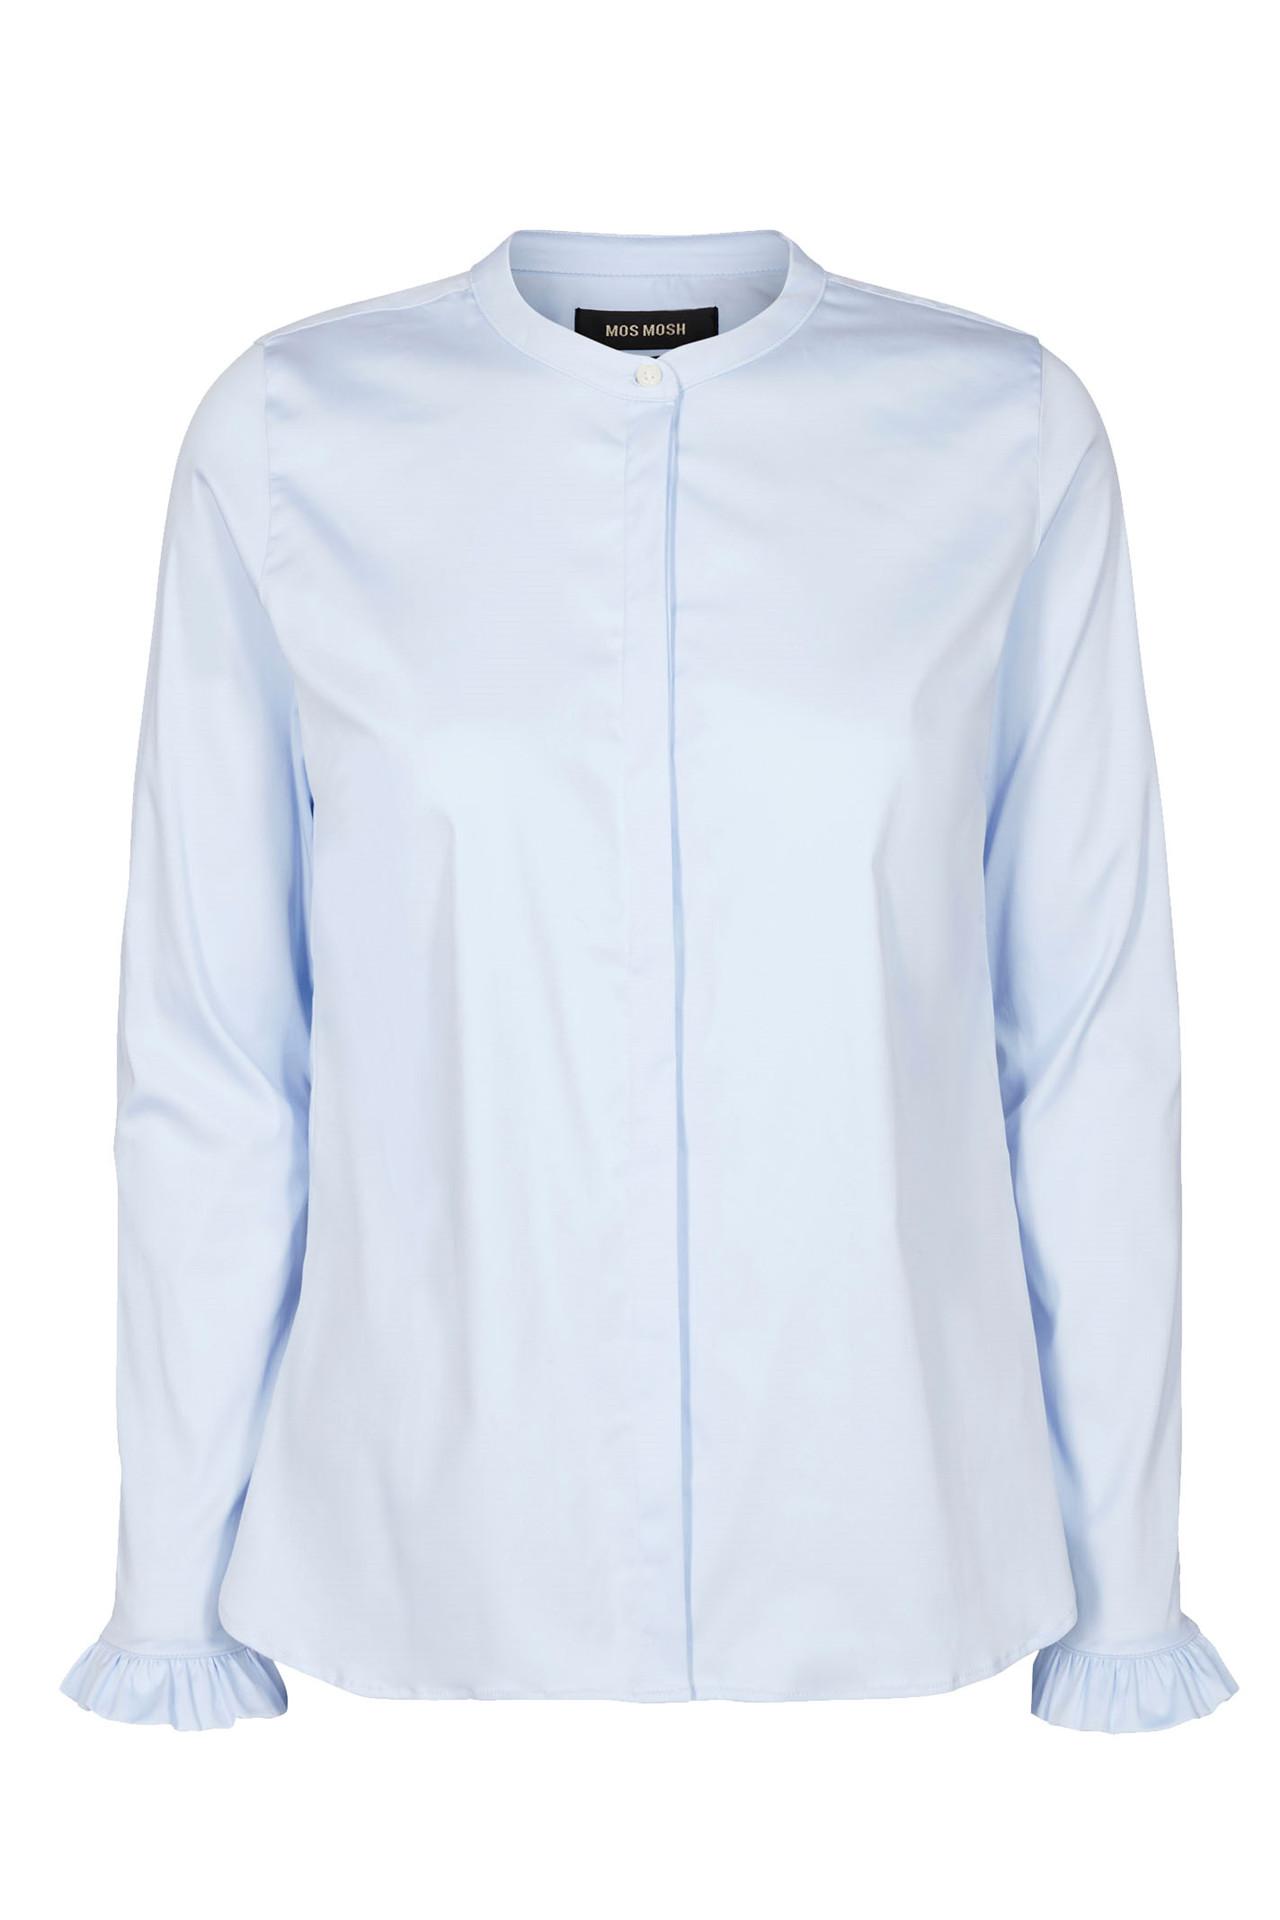 c16de84da61 MATTIE 119190 lyseblå skjorte fra Mos Mosh - Køb skjorte online her